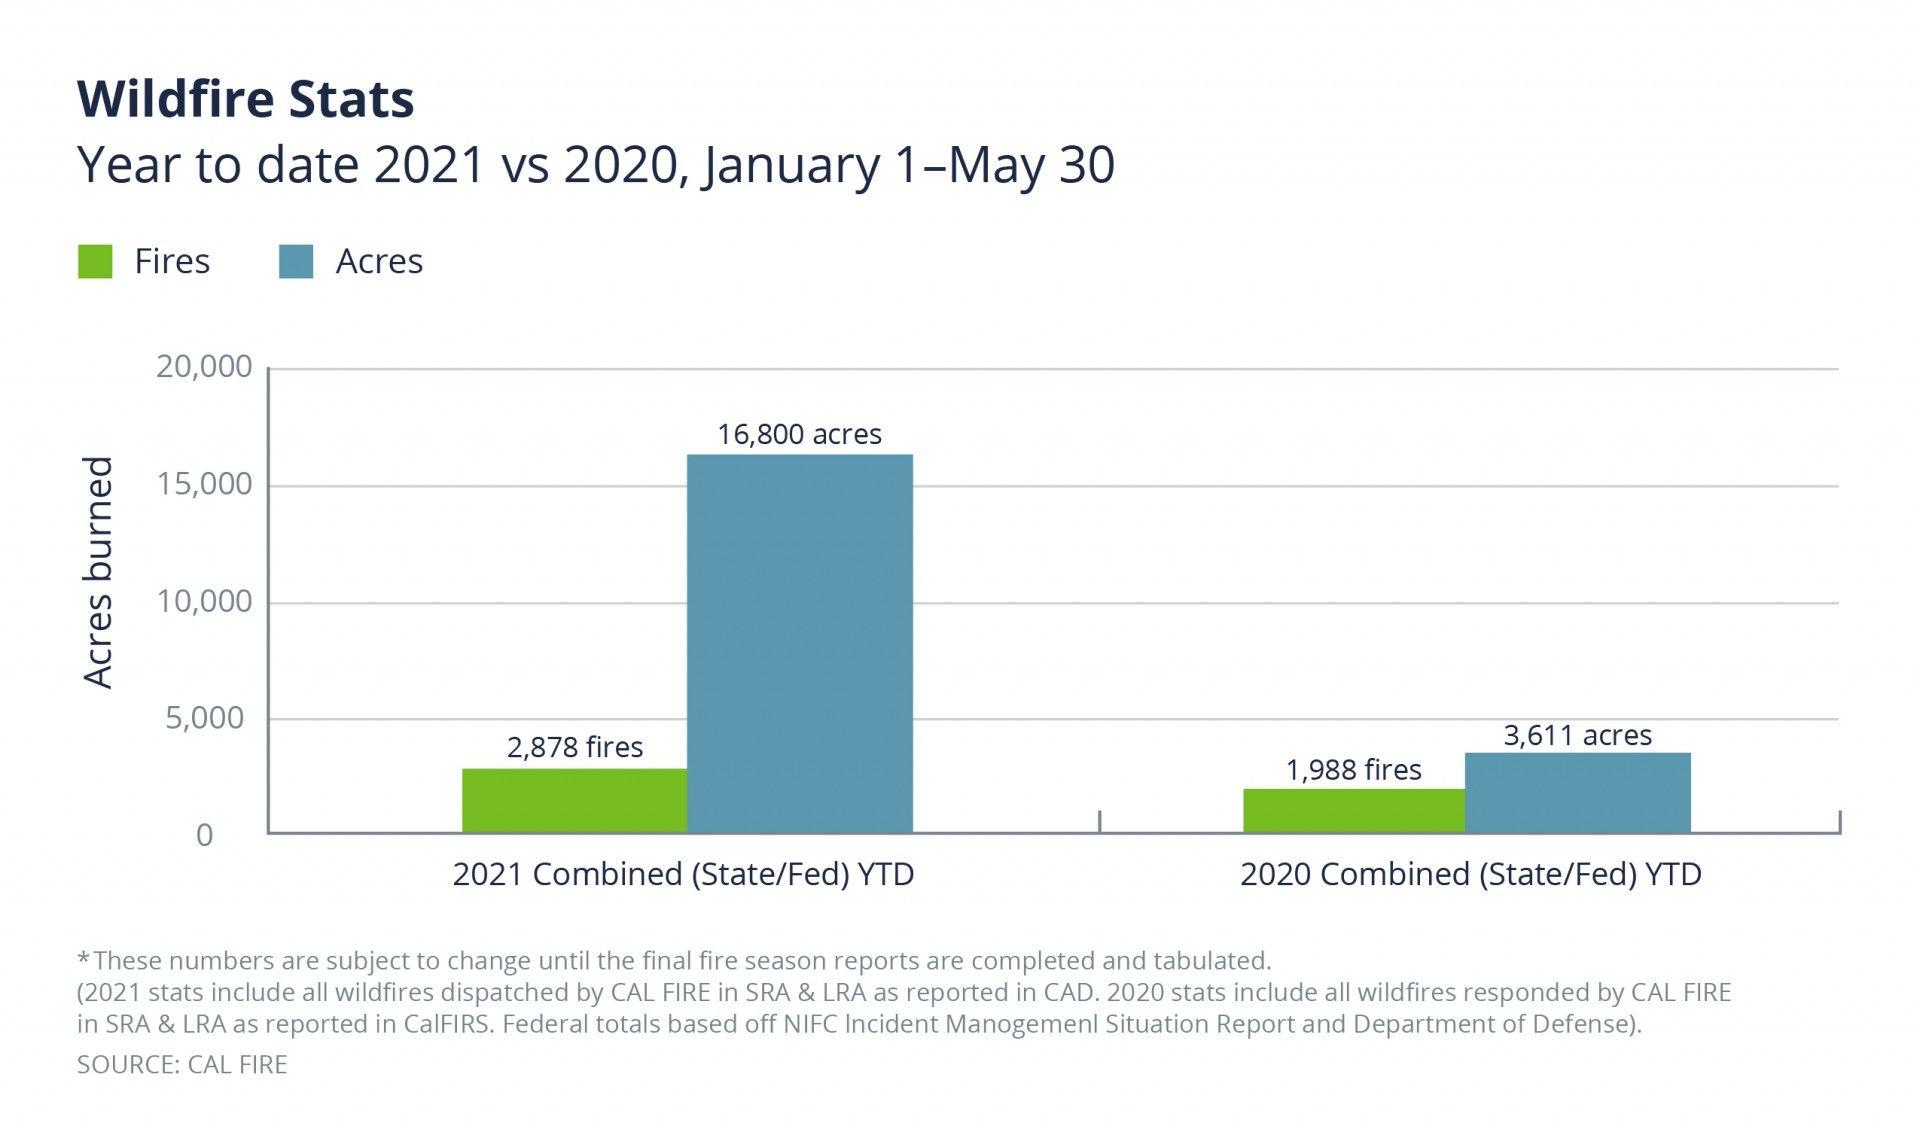 increased wildfires YTD 2021 vs 2020